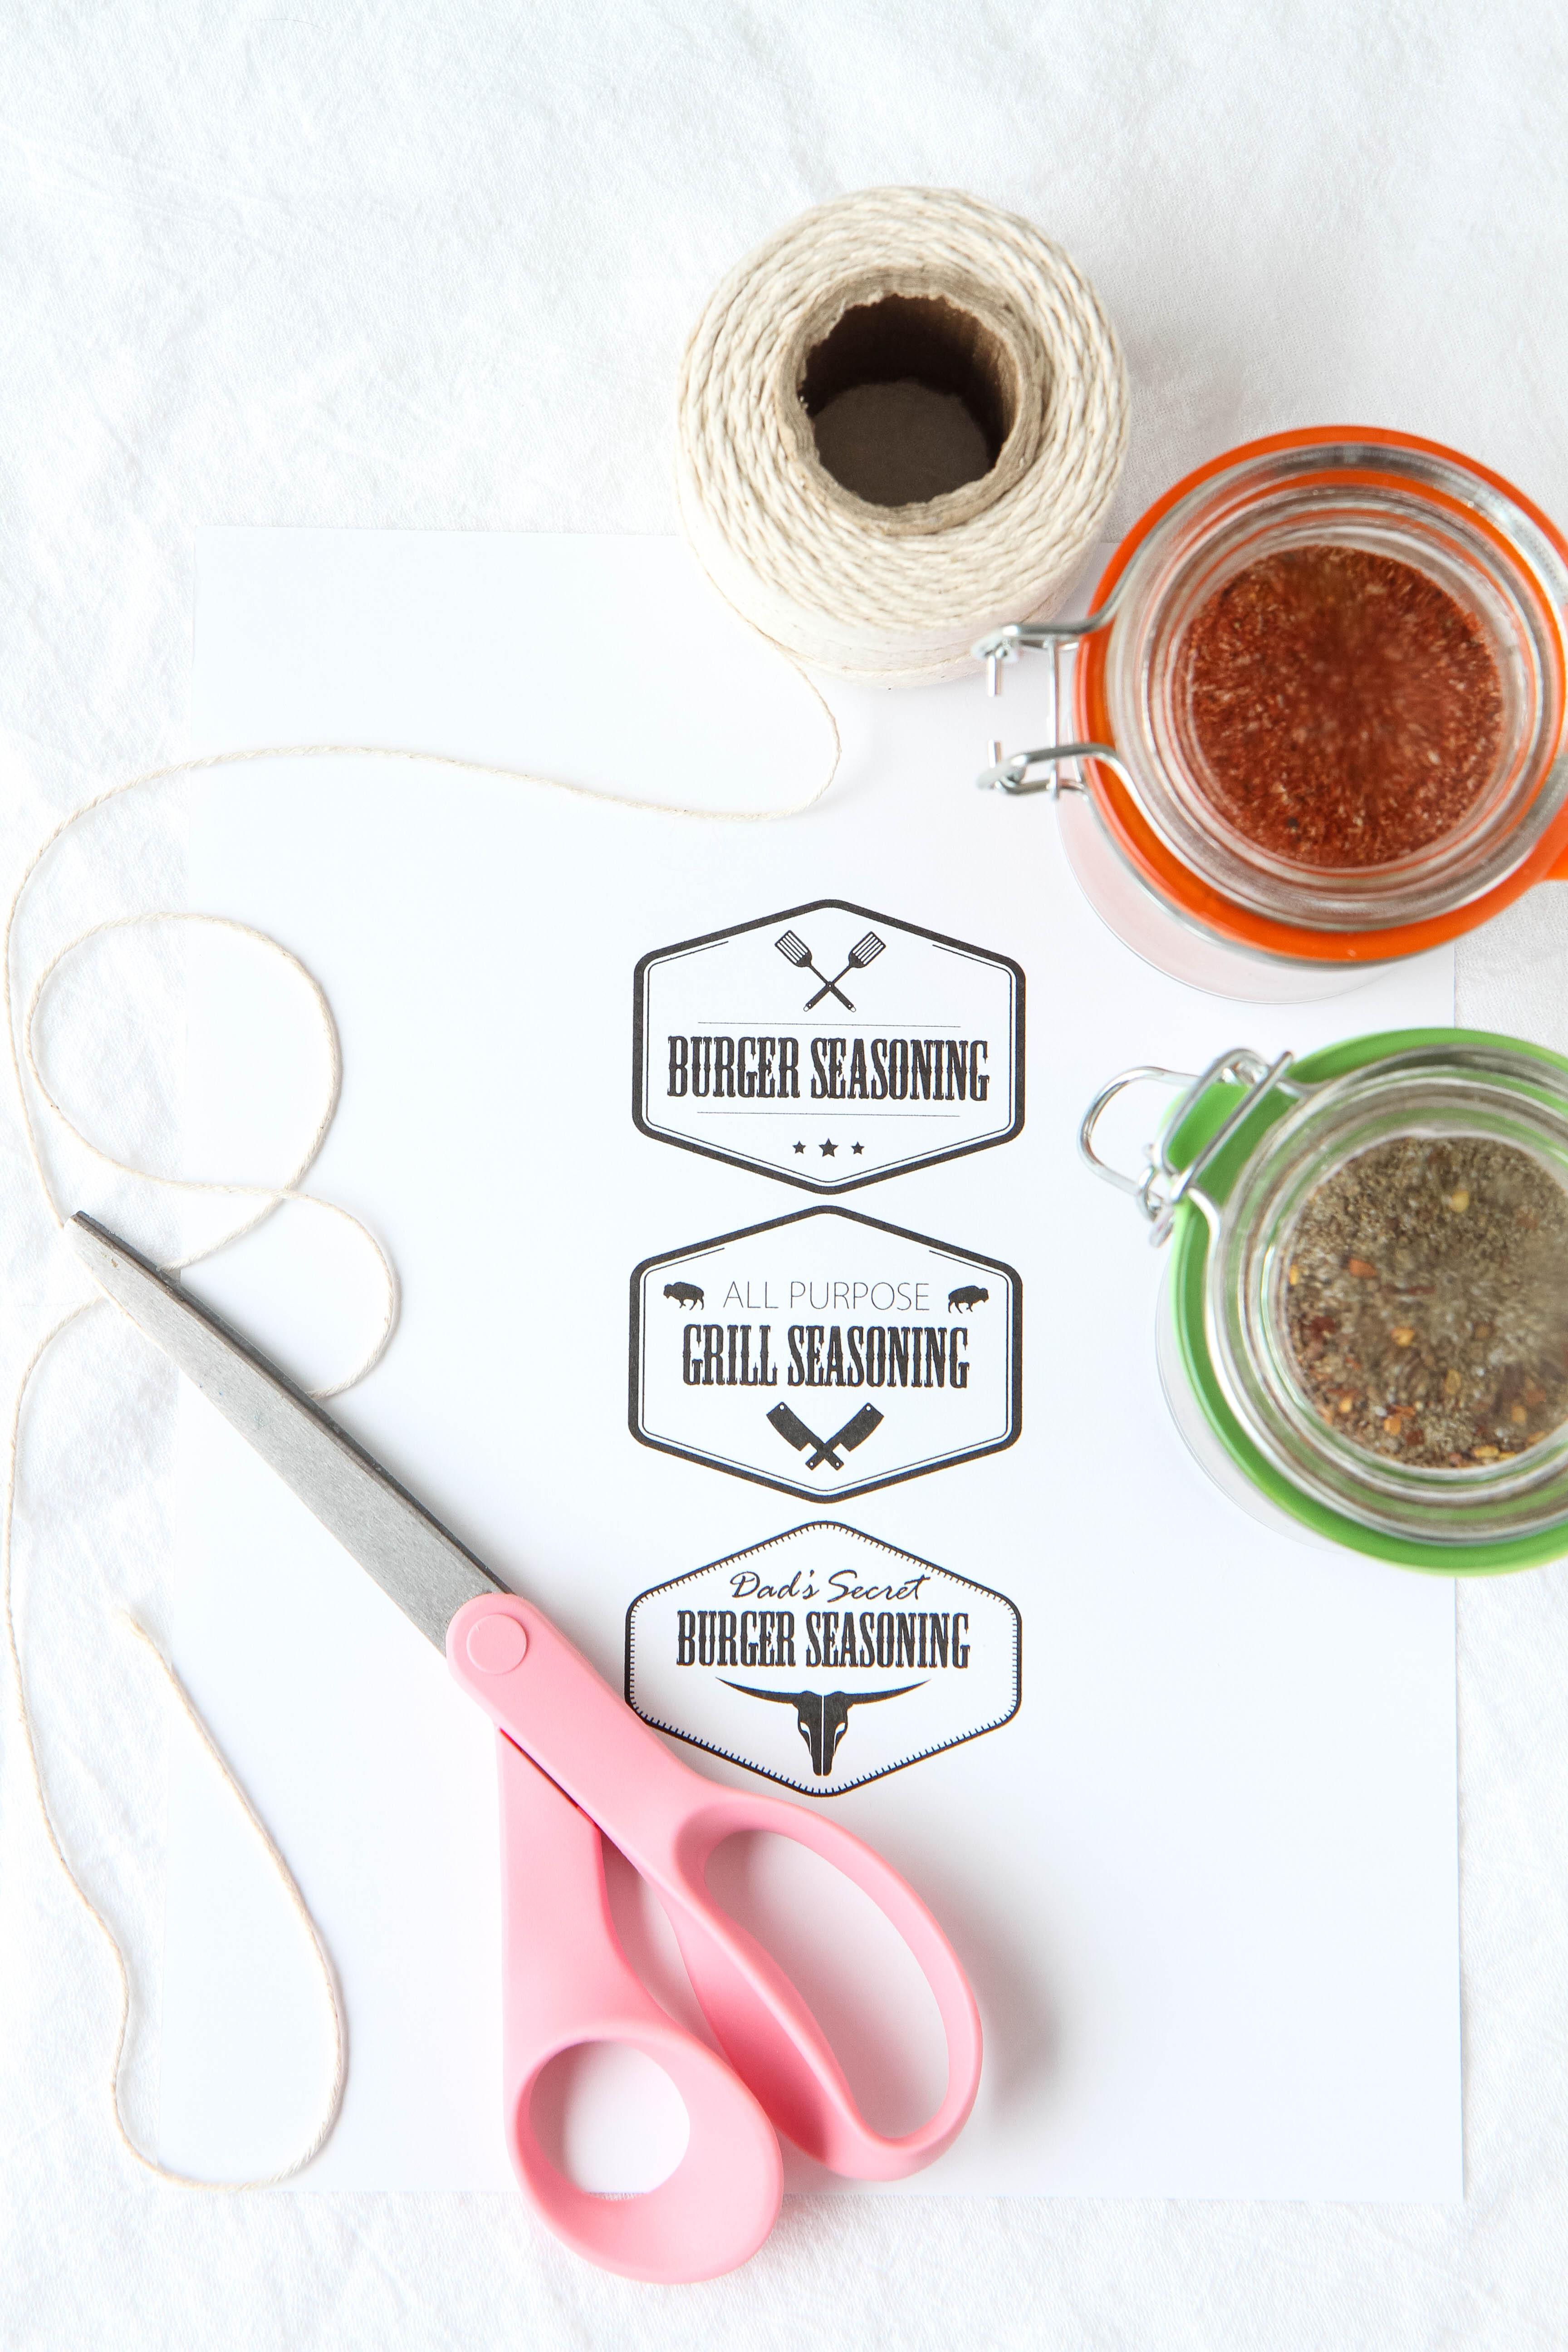 DIY grill seasonings plus free printable labels for gift giving!